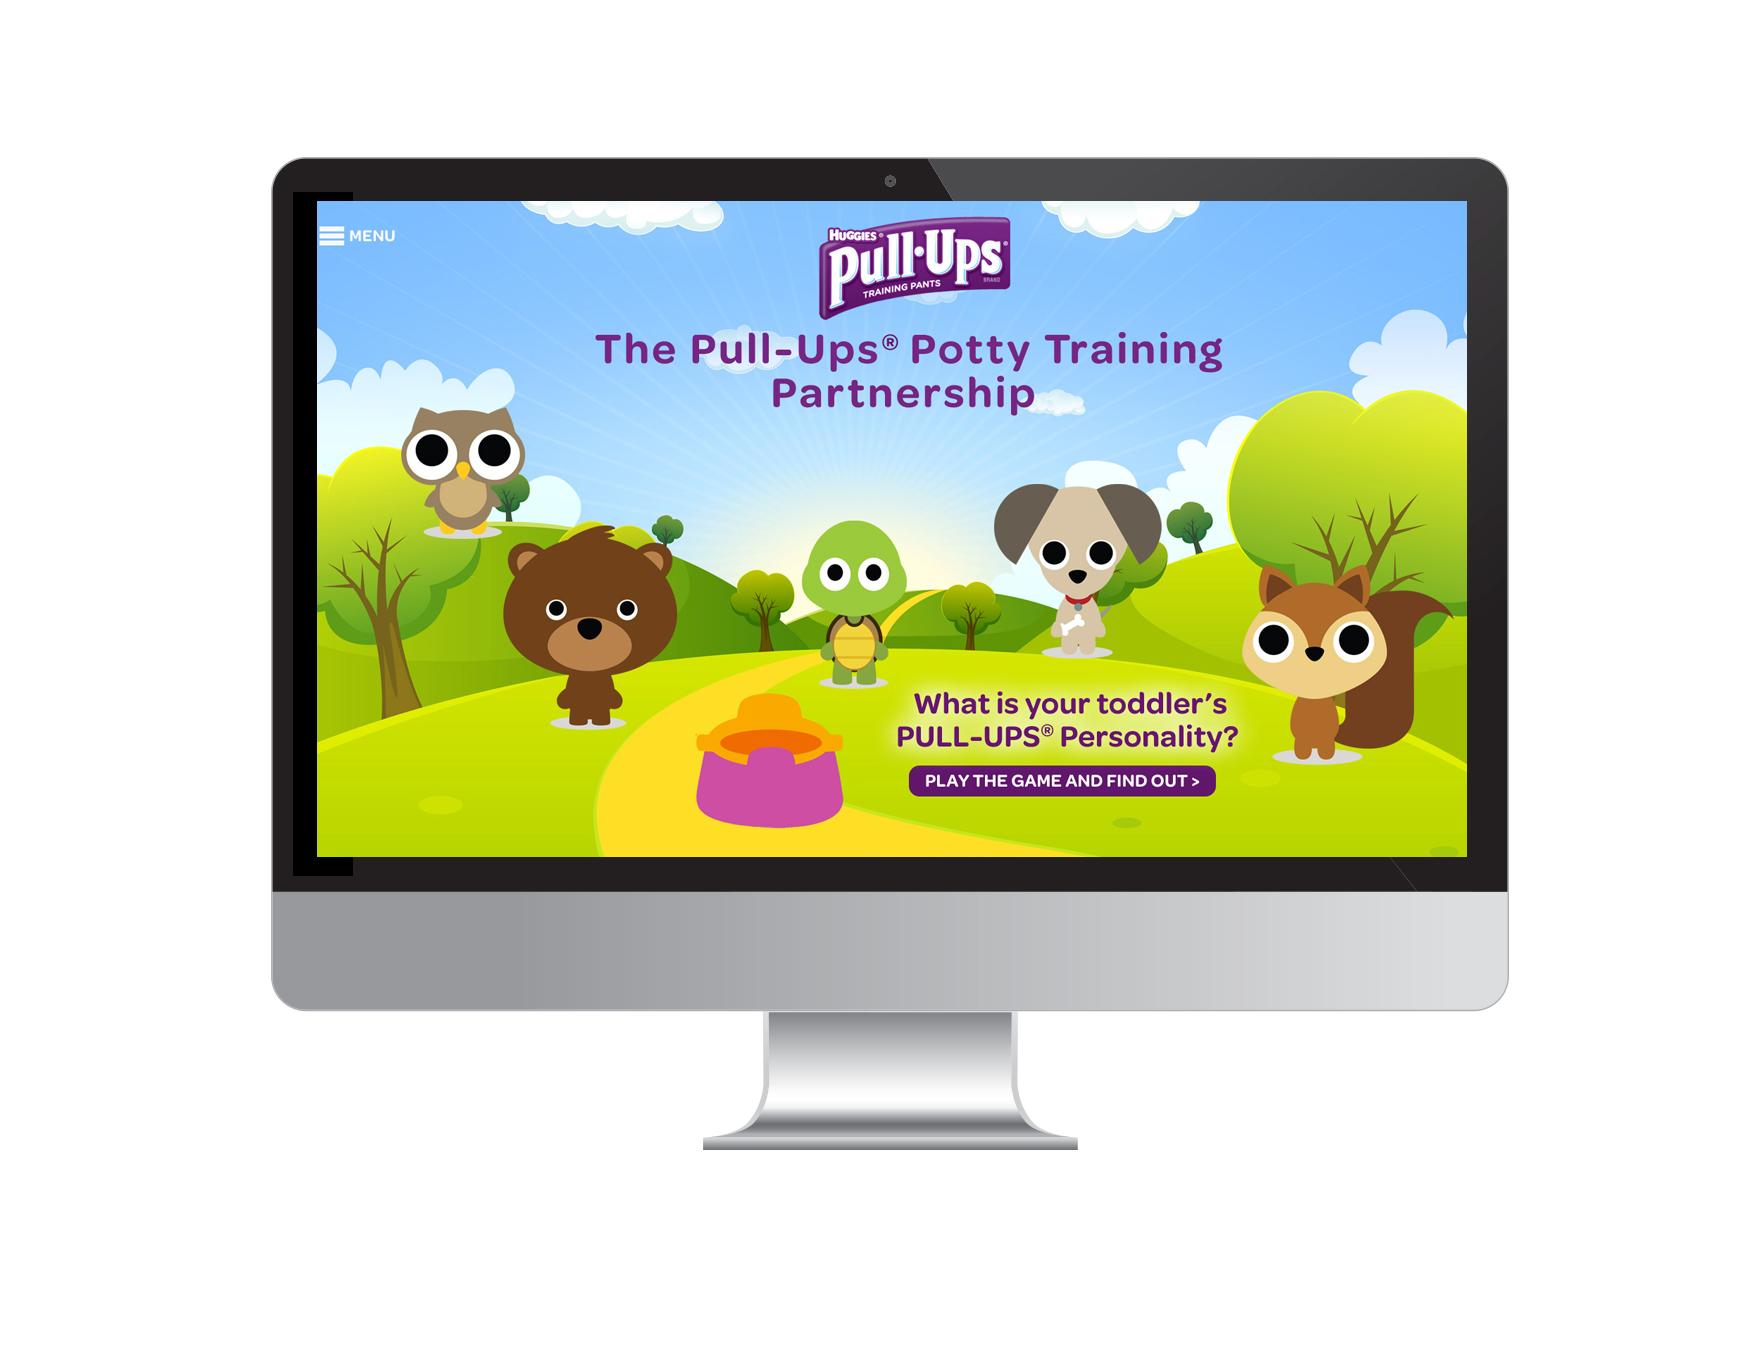 Home Page, Huggies Pull-Ups Potty Partnership =)